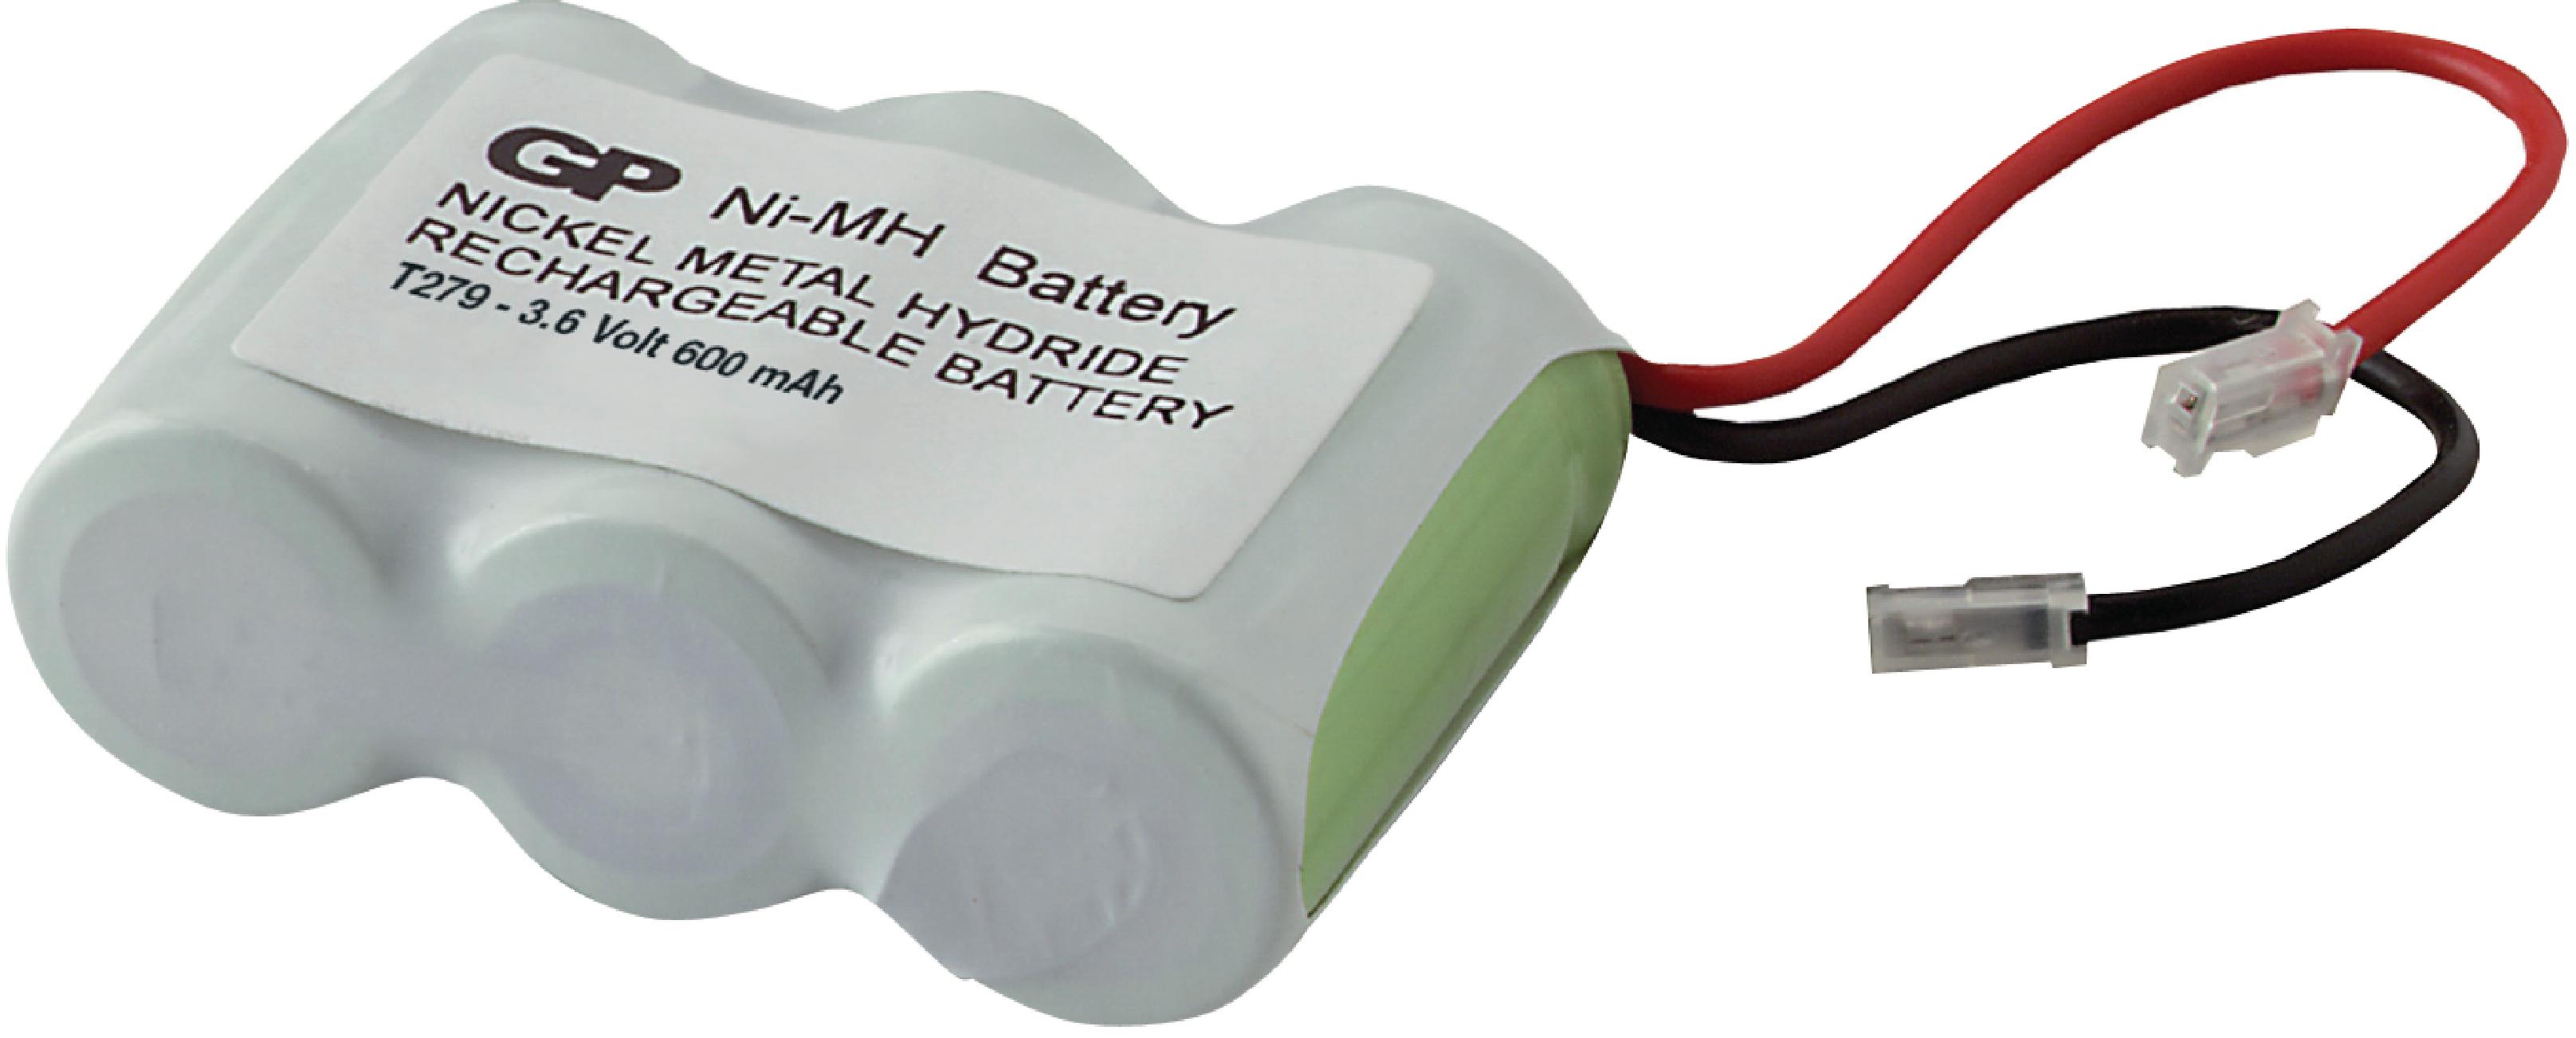 Akumulátor NiMH 3.6V/600mAh, ACCU-T279